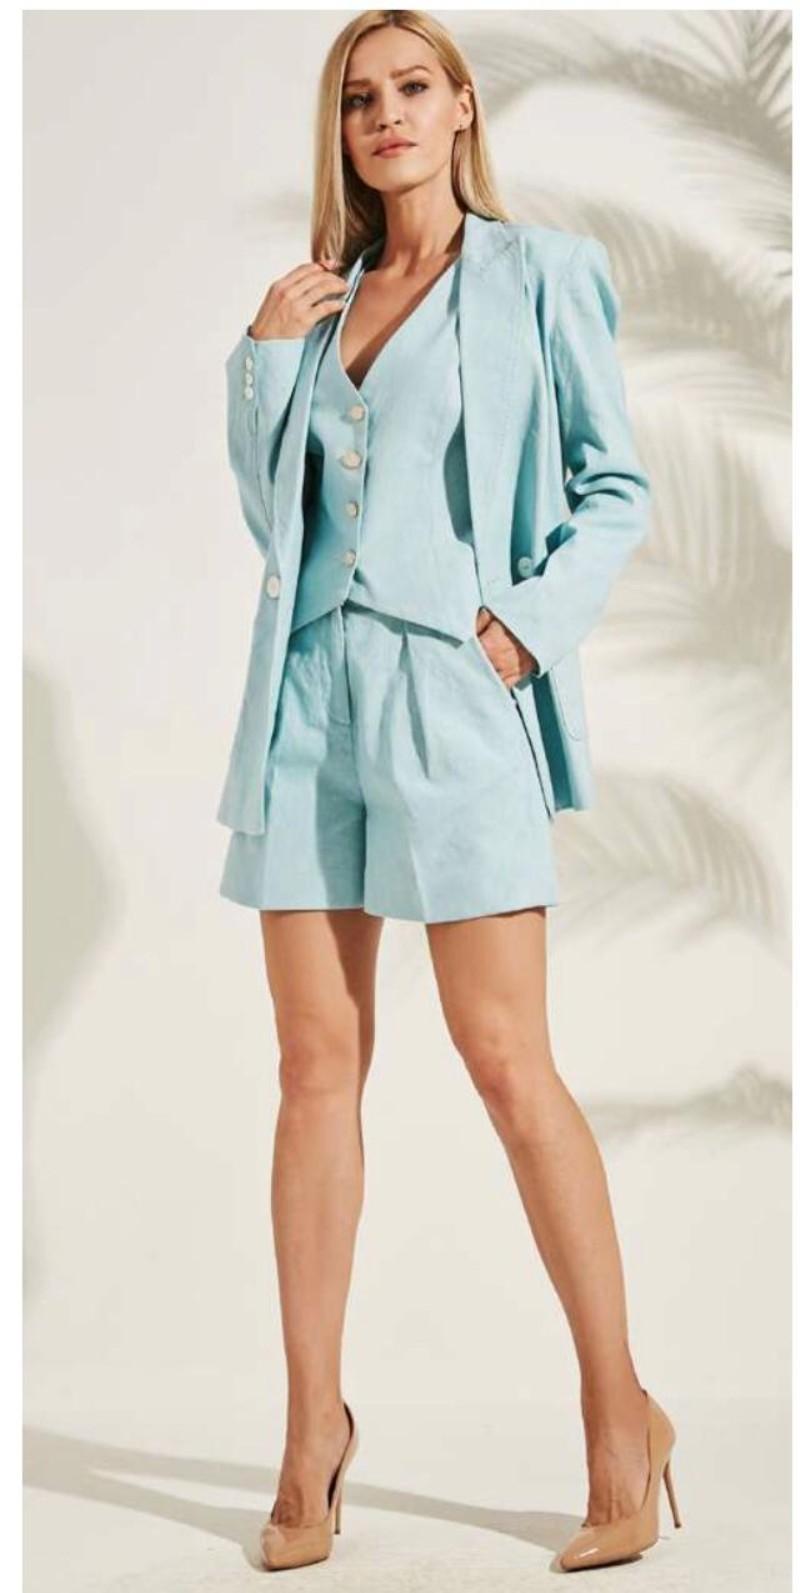 85 $ костюм / заказ модели от 5 шт ( размеры от S - XL)